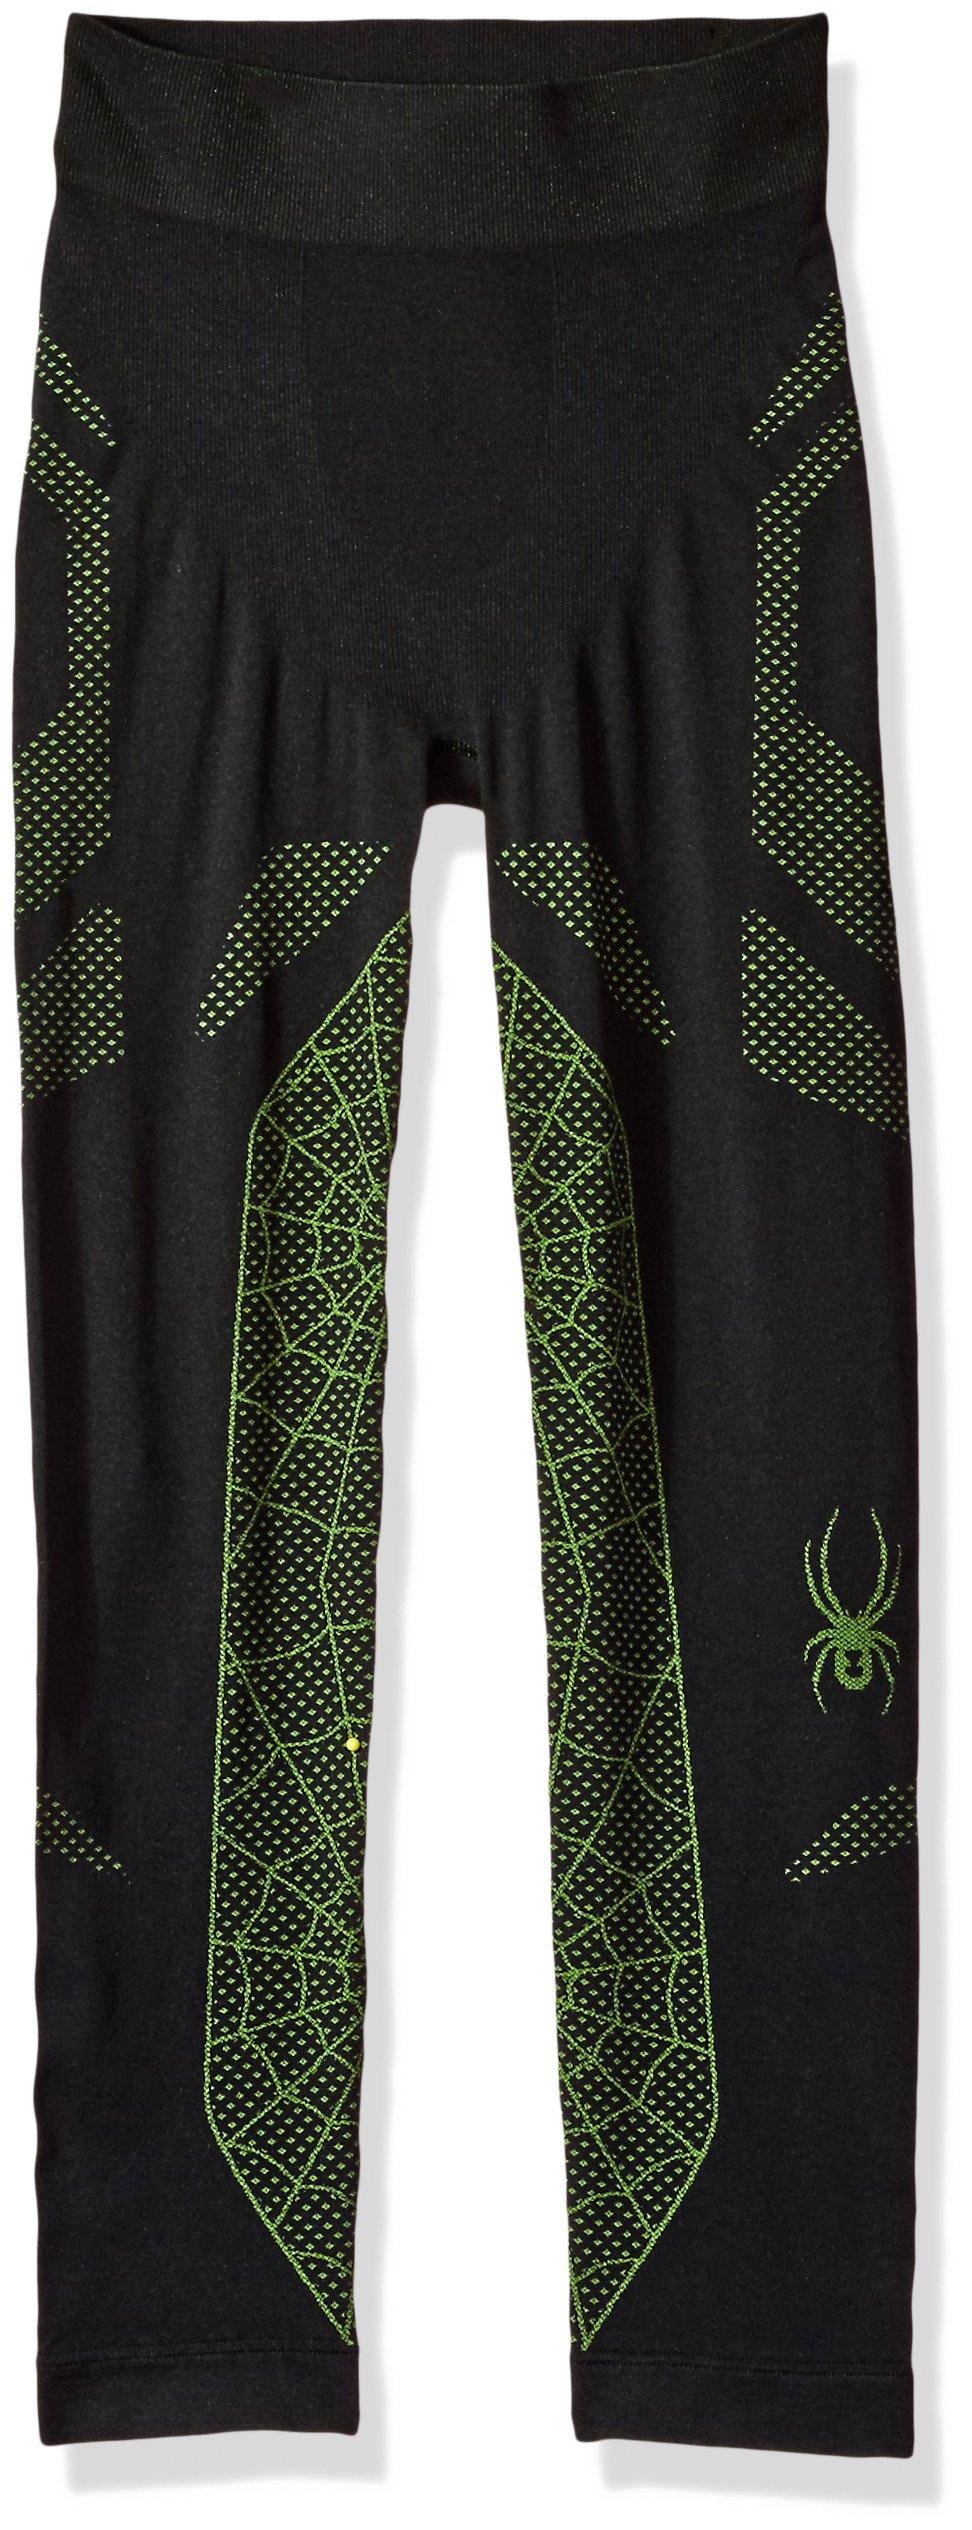 Spyder Boy's Racer Pant, Black/Fresh, Small/Medium